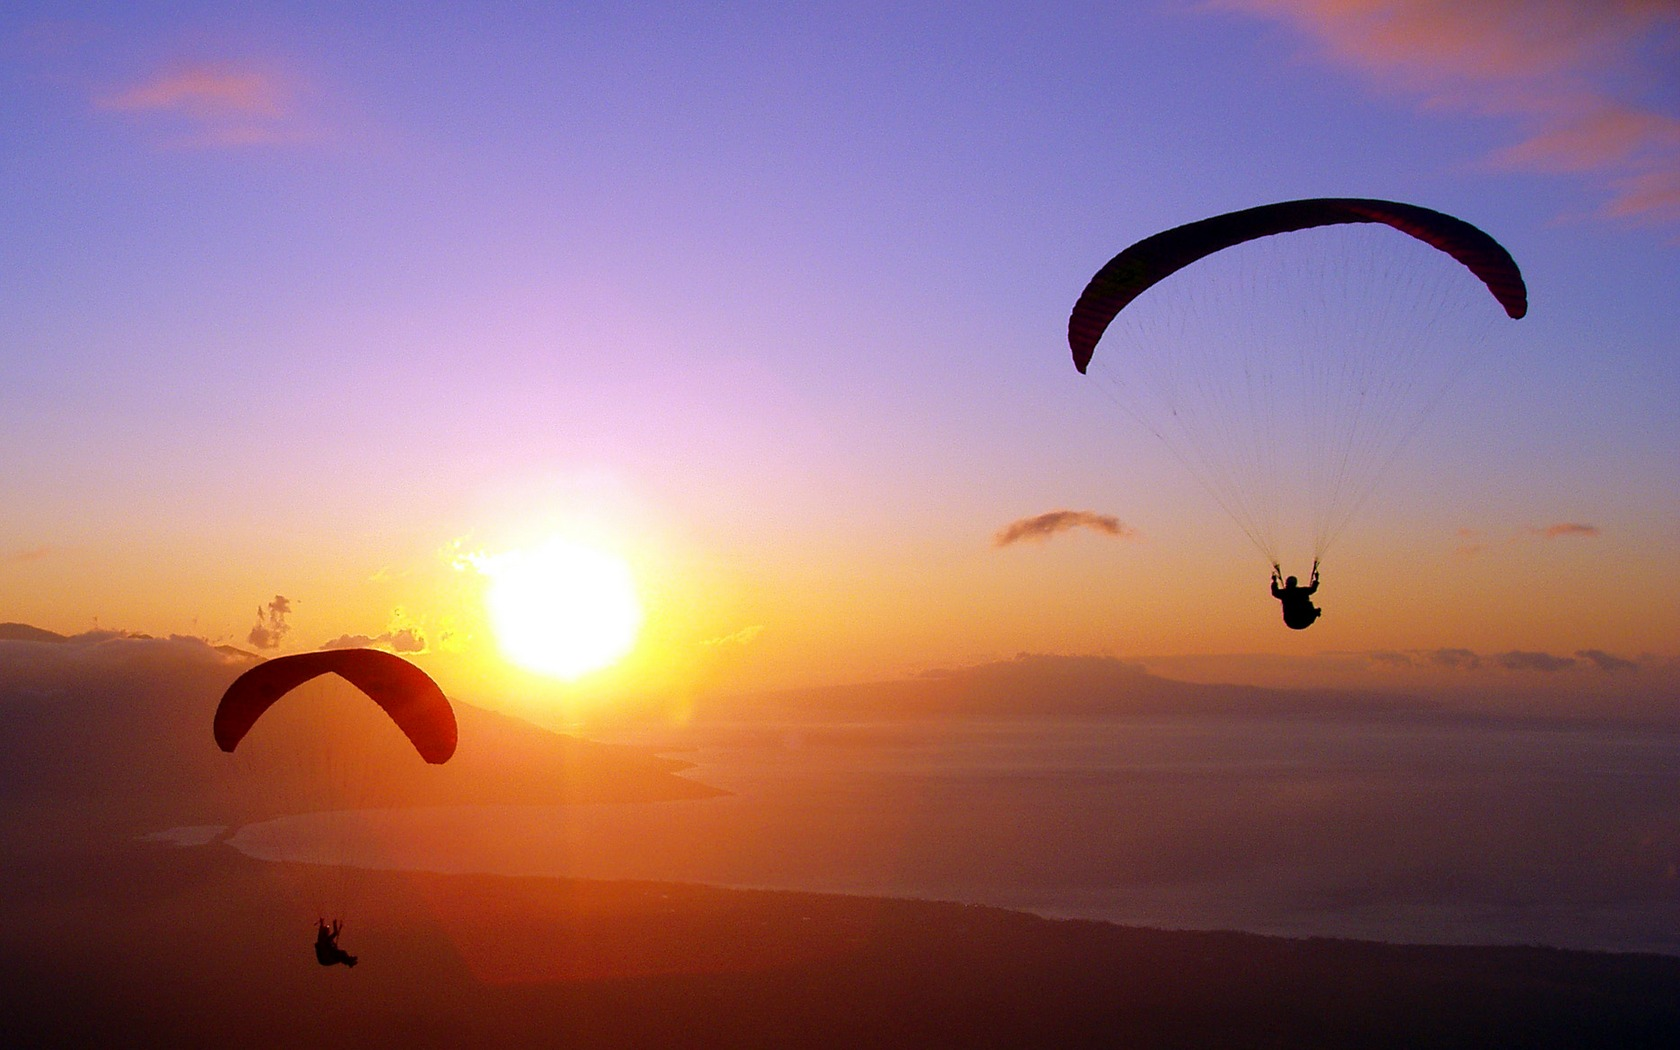 skydiving wallpaper sunset free - photo #1